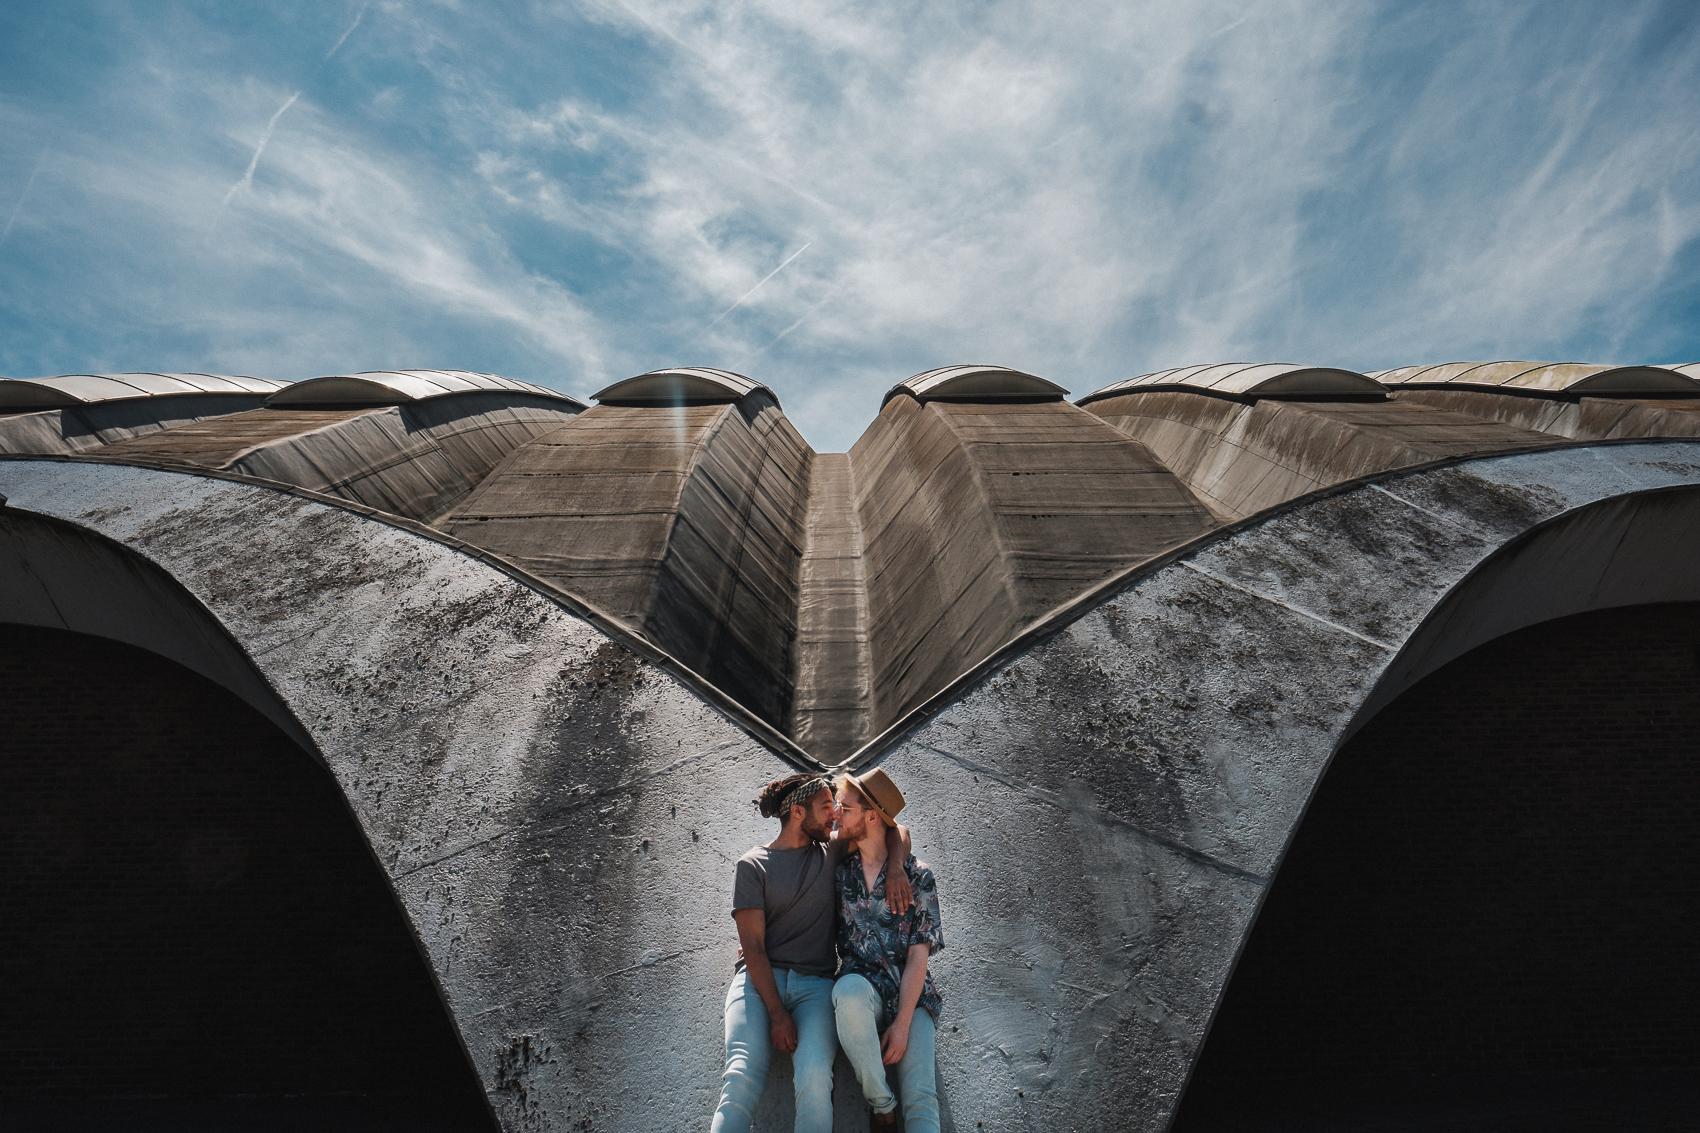 Love, love, love... #fuji #fujixt2 #groom #samesex #samesexwedding #wedding #weddingday #weddingphoto #weddingphotography #weddingphotographer #weddingstyle #iso800 #love #hugs #kisses #mywed #bluesky #blueskies #fearless #photoshoot #instawed #instalove #instalike #instagood #picoftheday #architecture